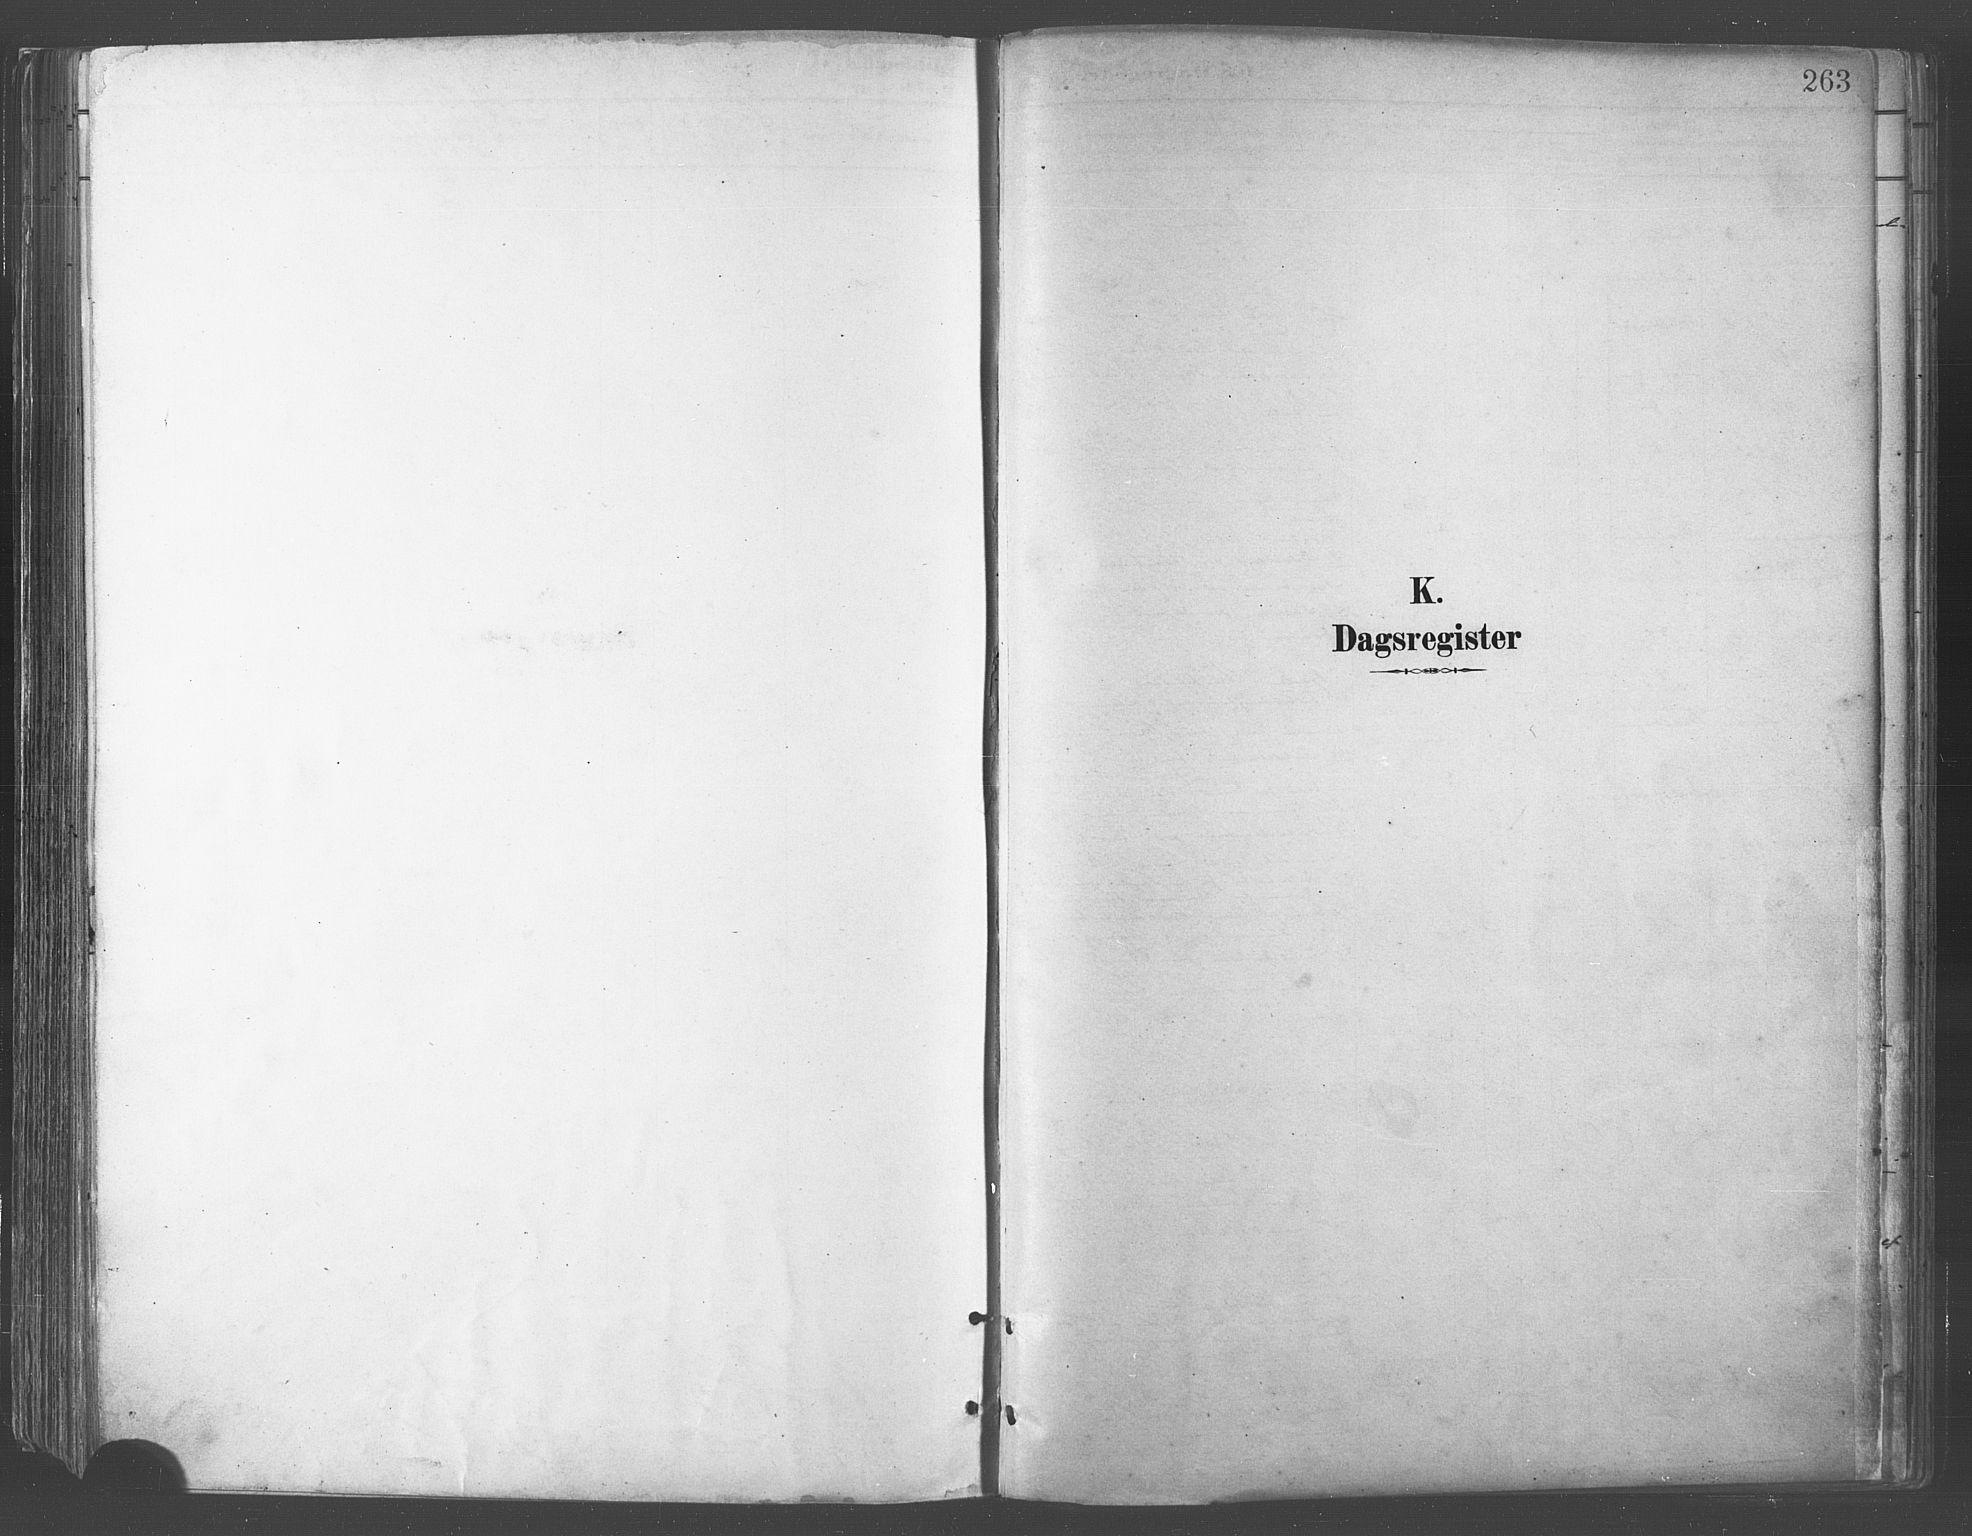 SATØ, Balsfjord sokneprestembete, Parish register (official) no. 5, 1884-1897, p. 263